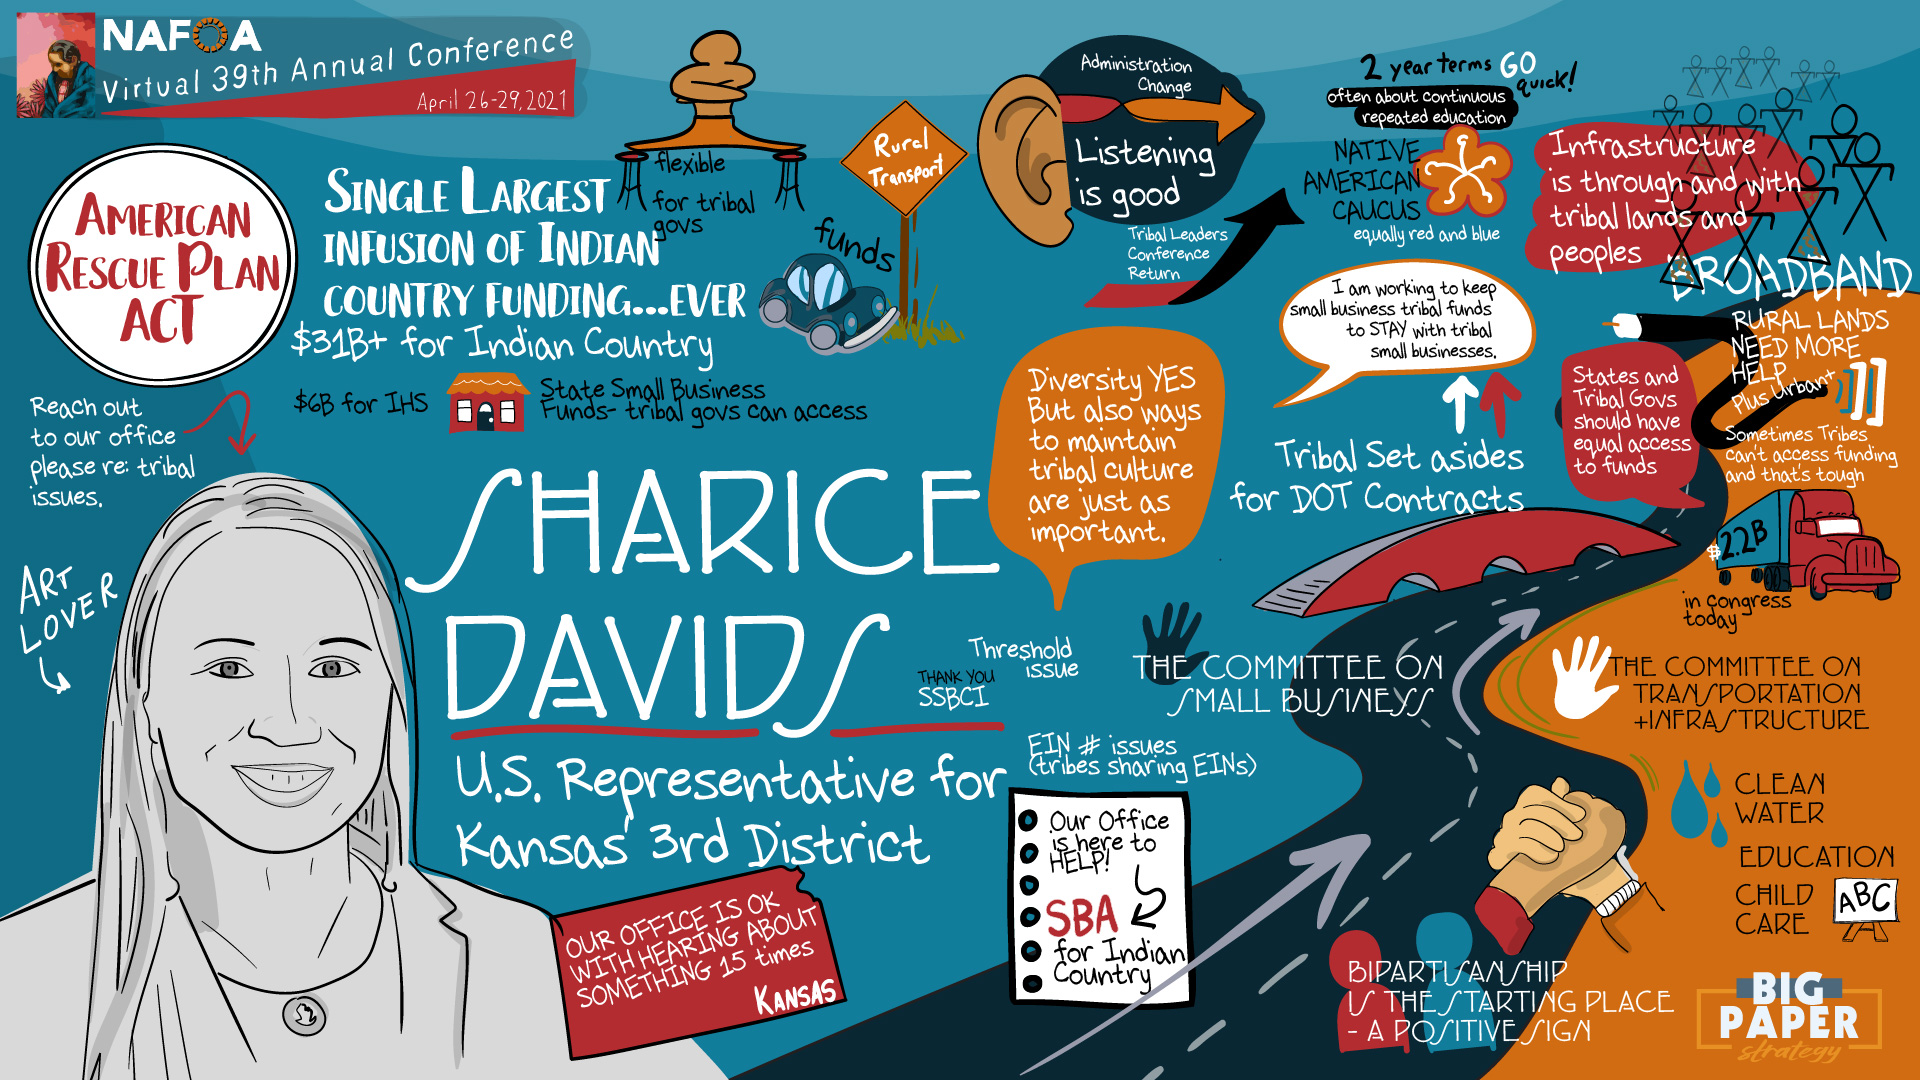 Congressional Keynote with Sharice Davids, U.S. Representative for Kansas' 3rd District